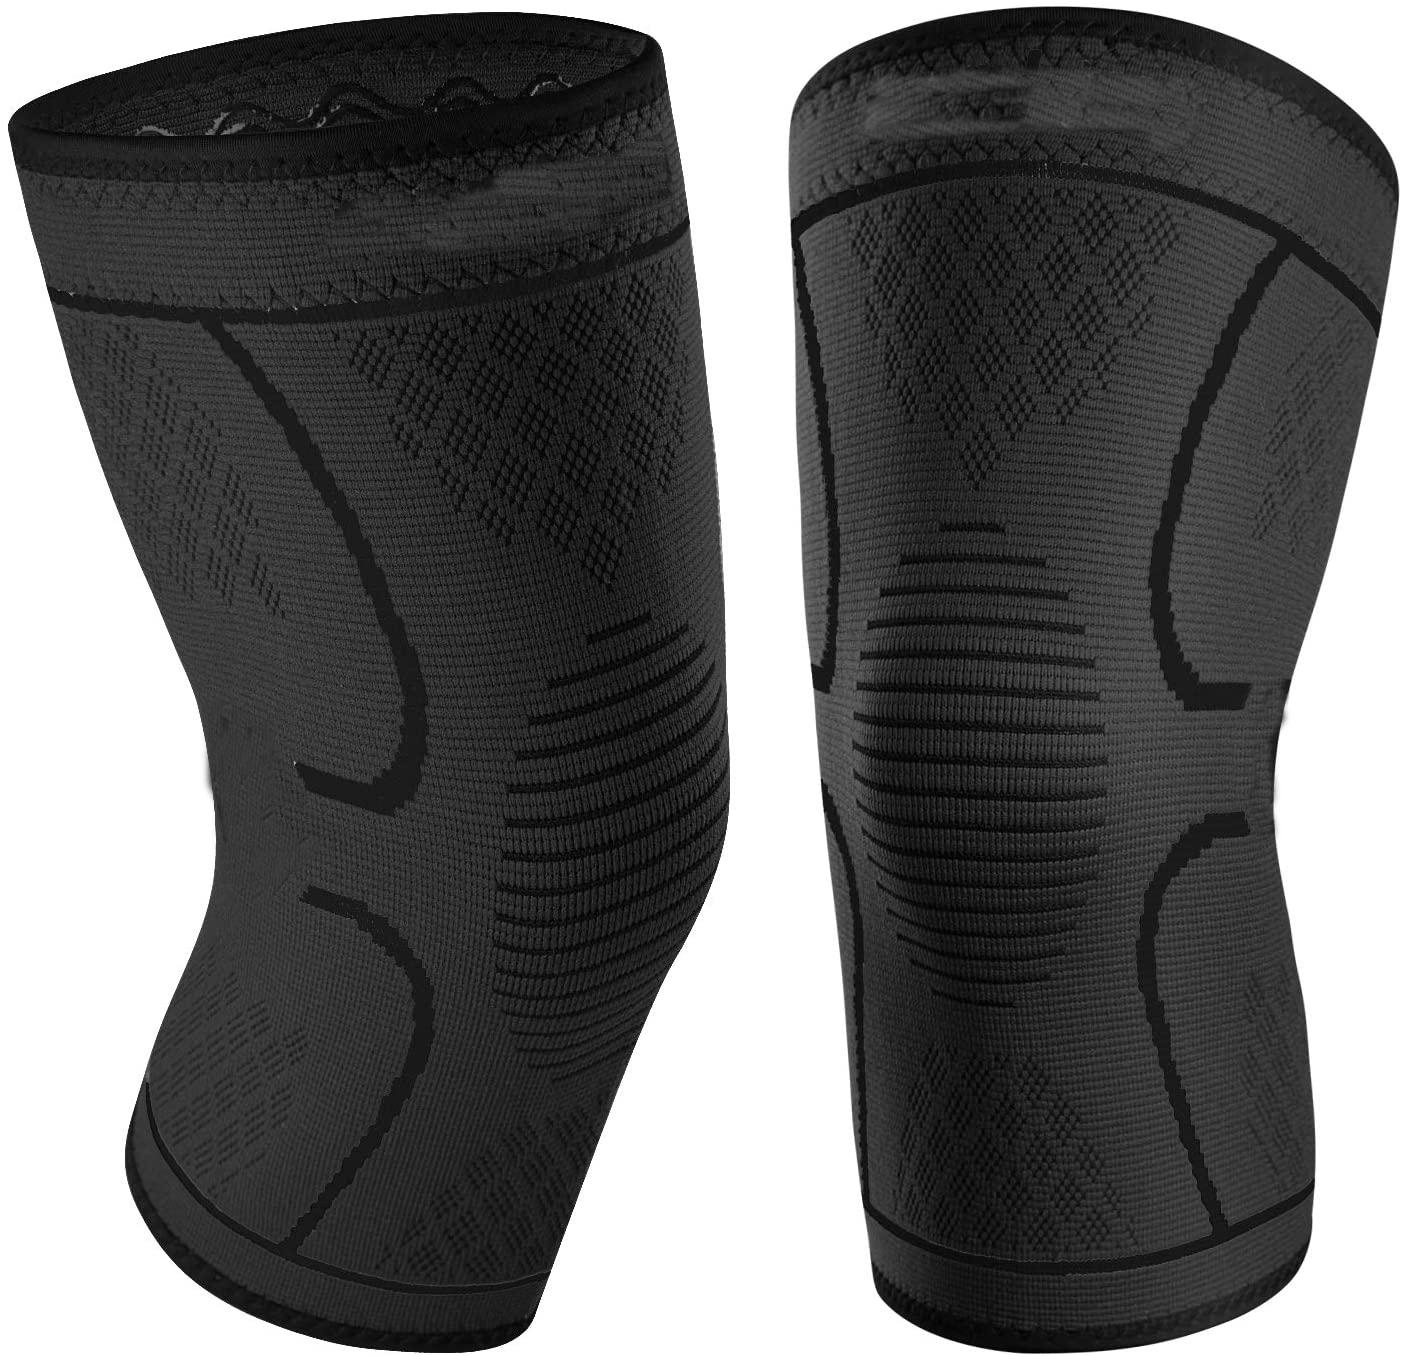 OA CE Medical Adjustable New Athletics Best Excellent Knitting Compression Knee Brace Sleeve